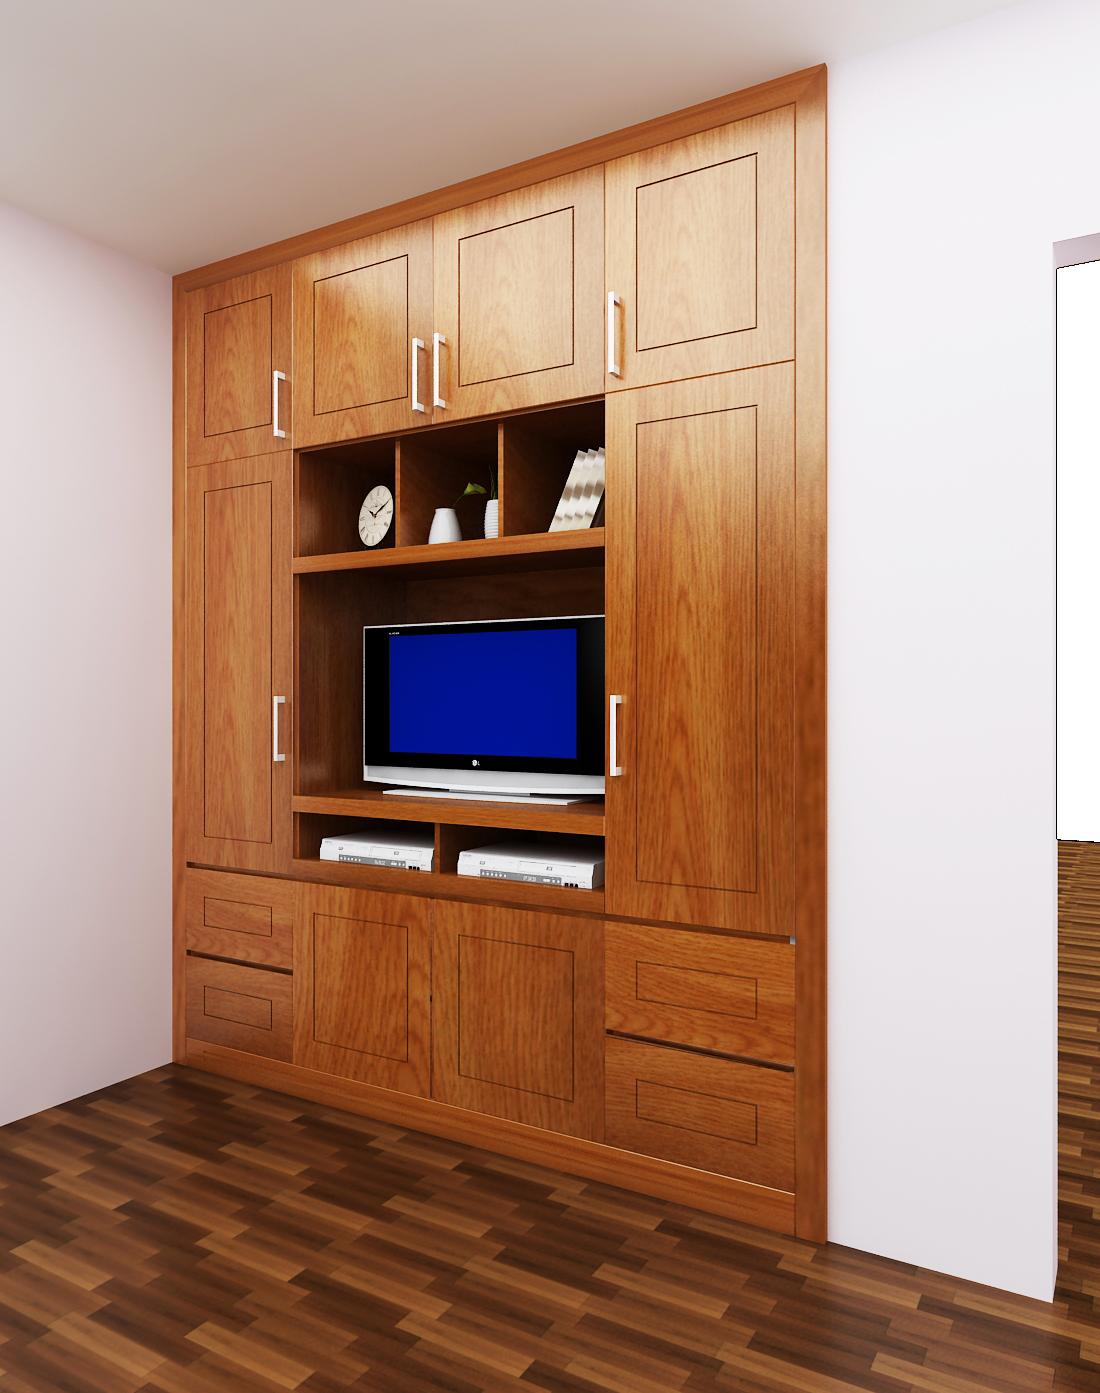 Tủ áo + Kệ tivi